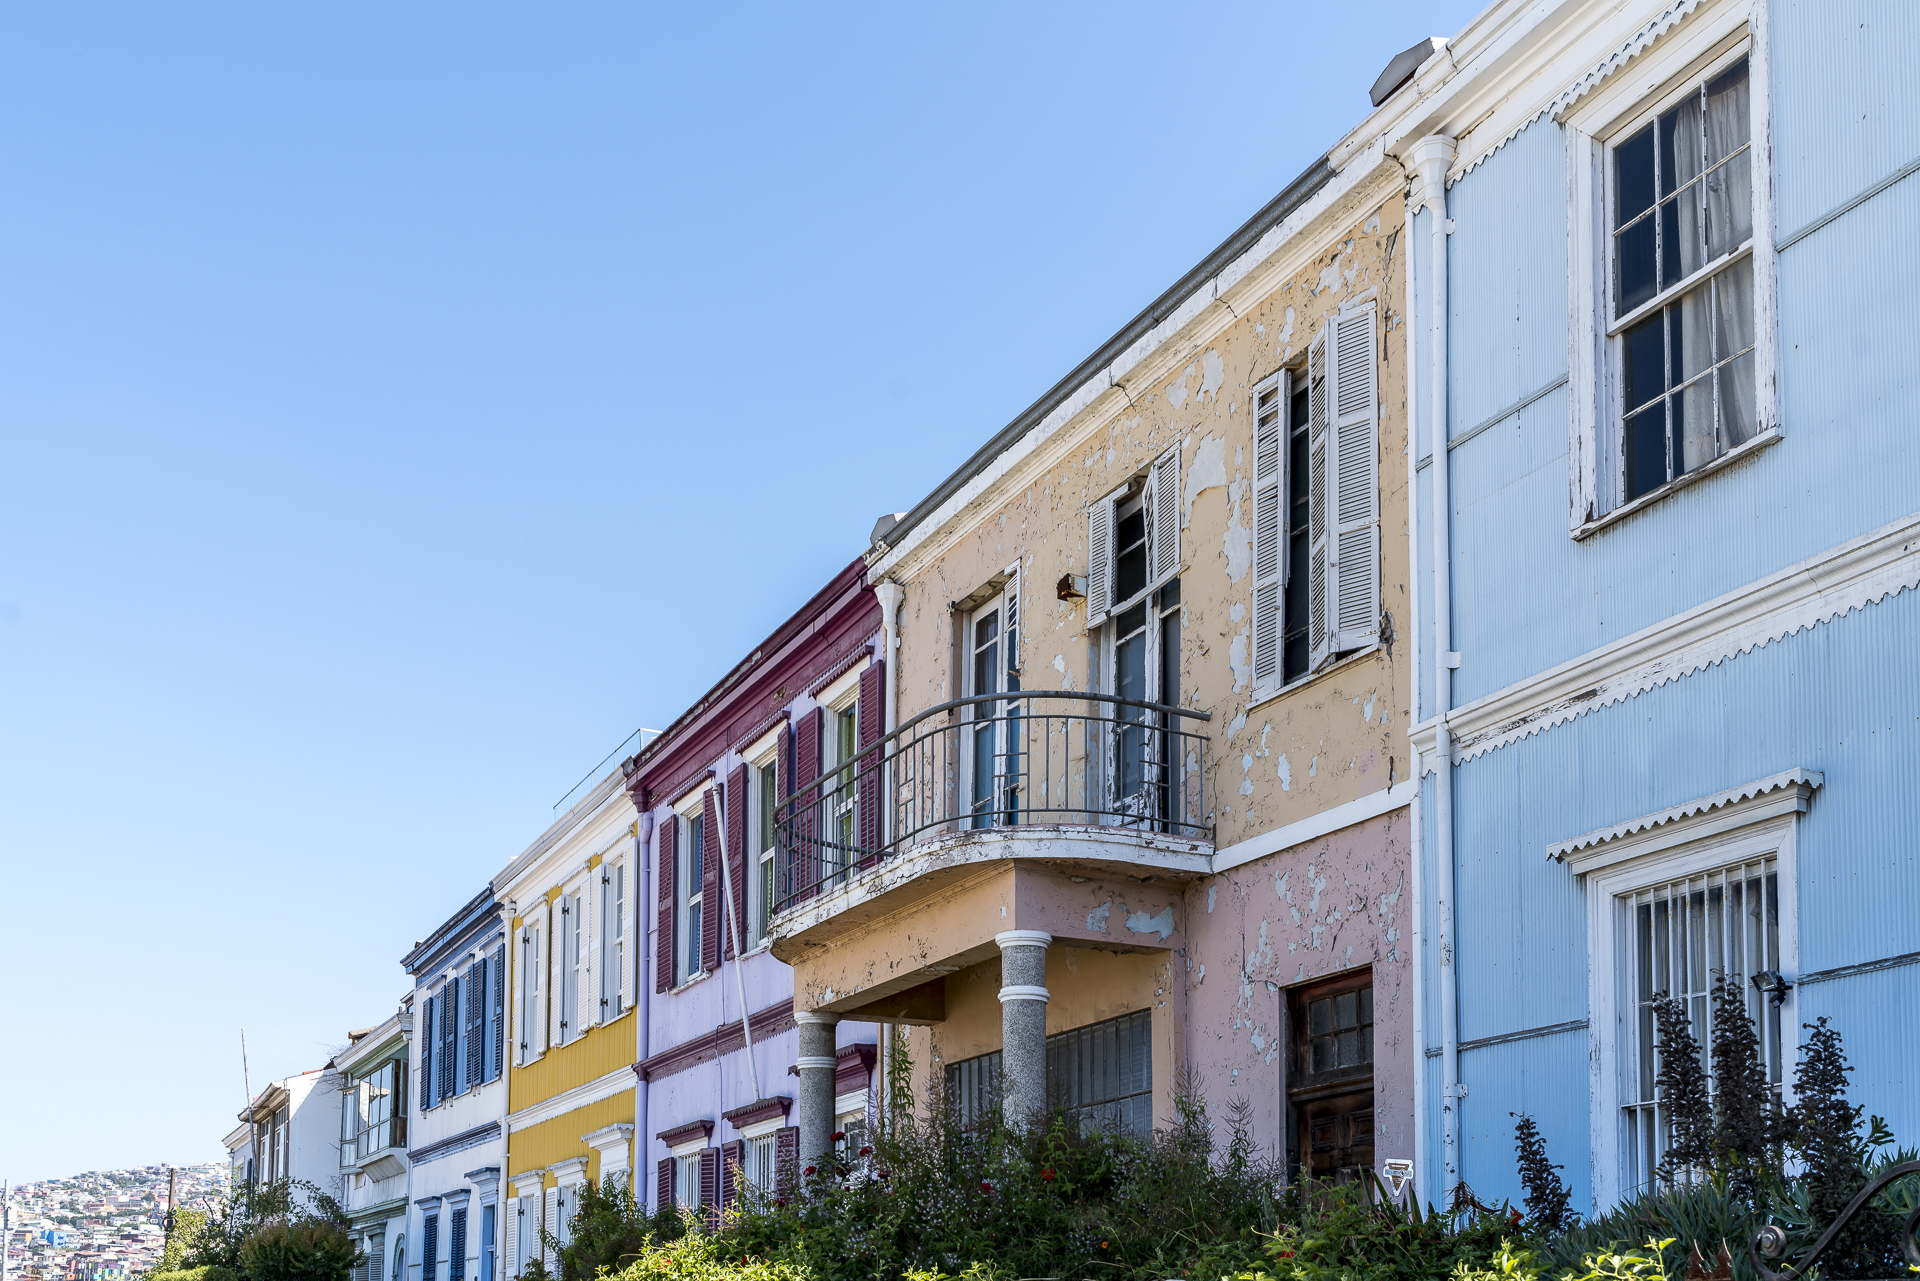 Esmeralda Valparaiso